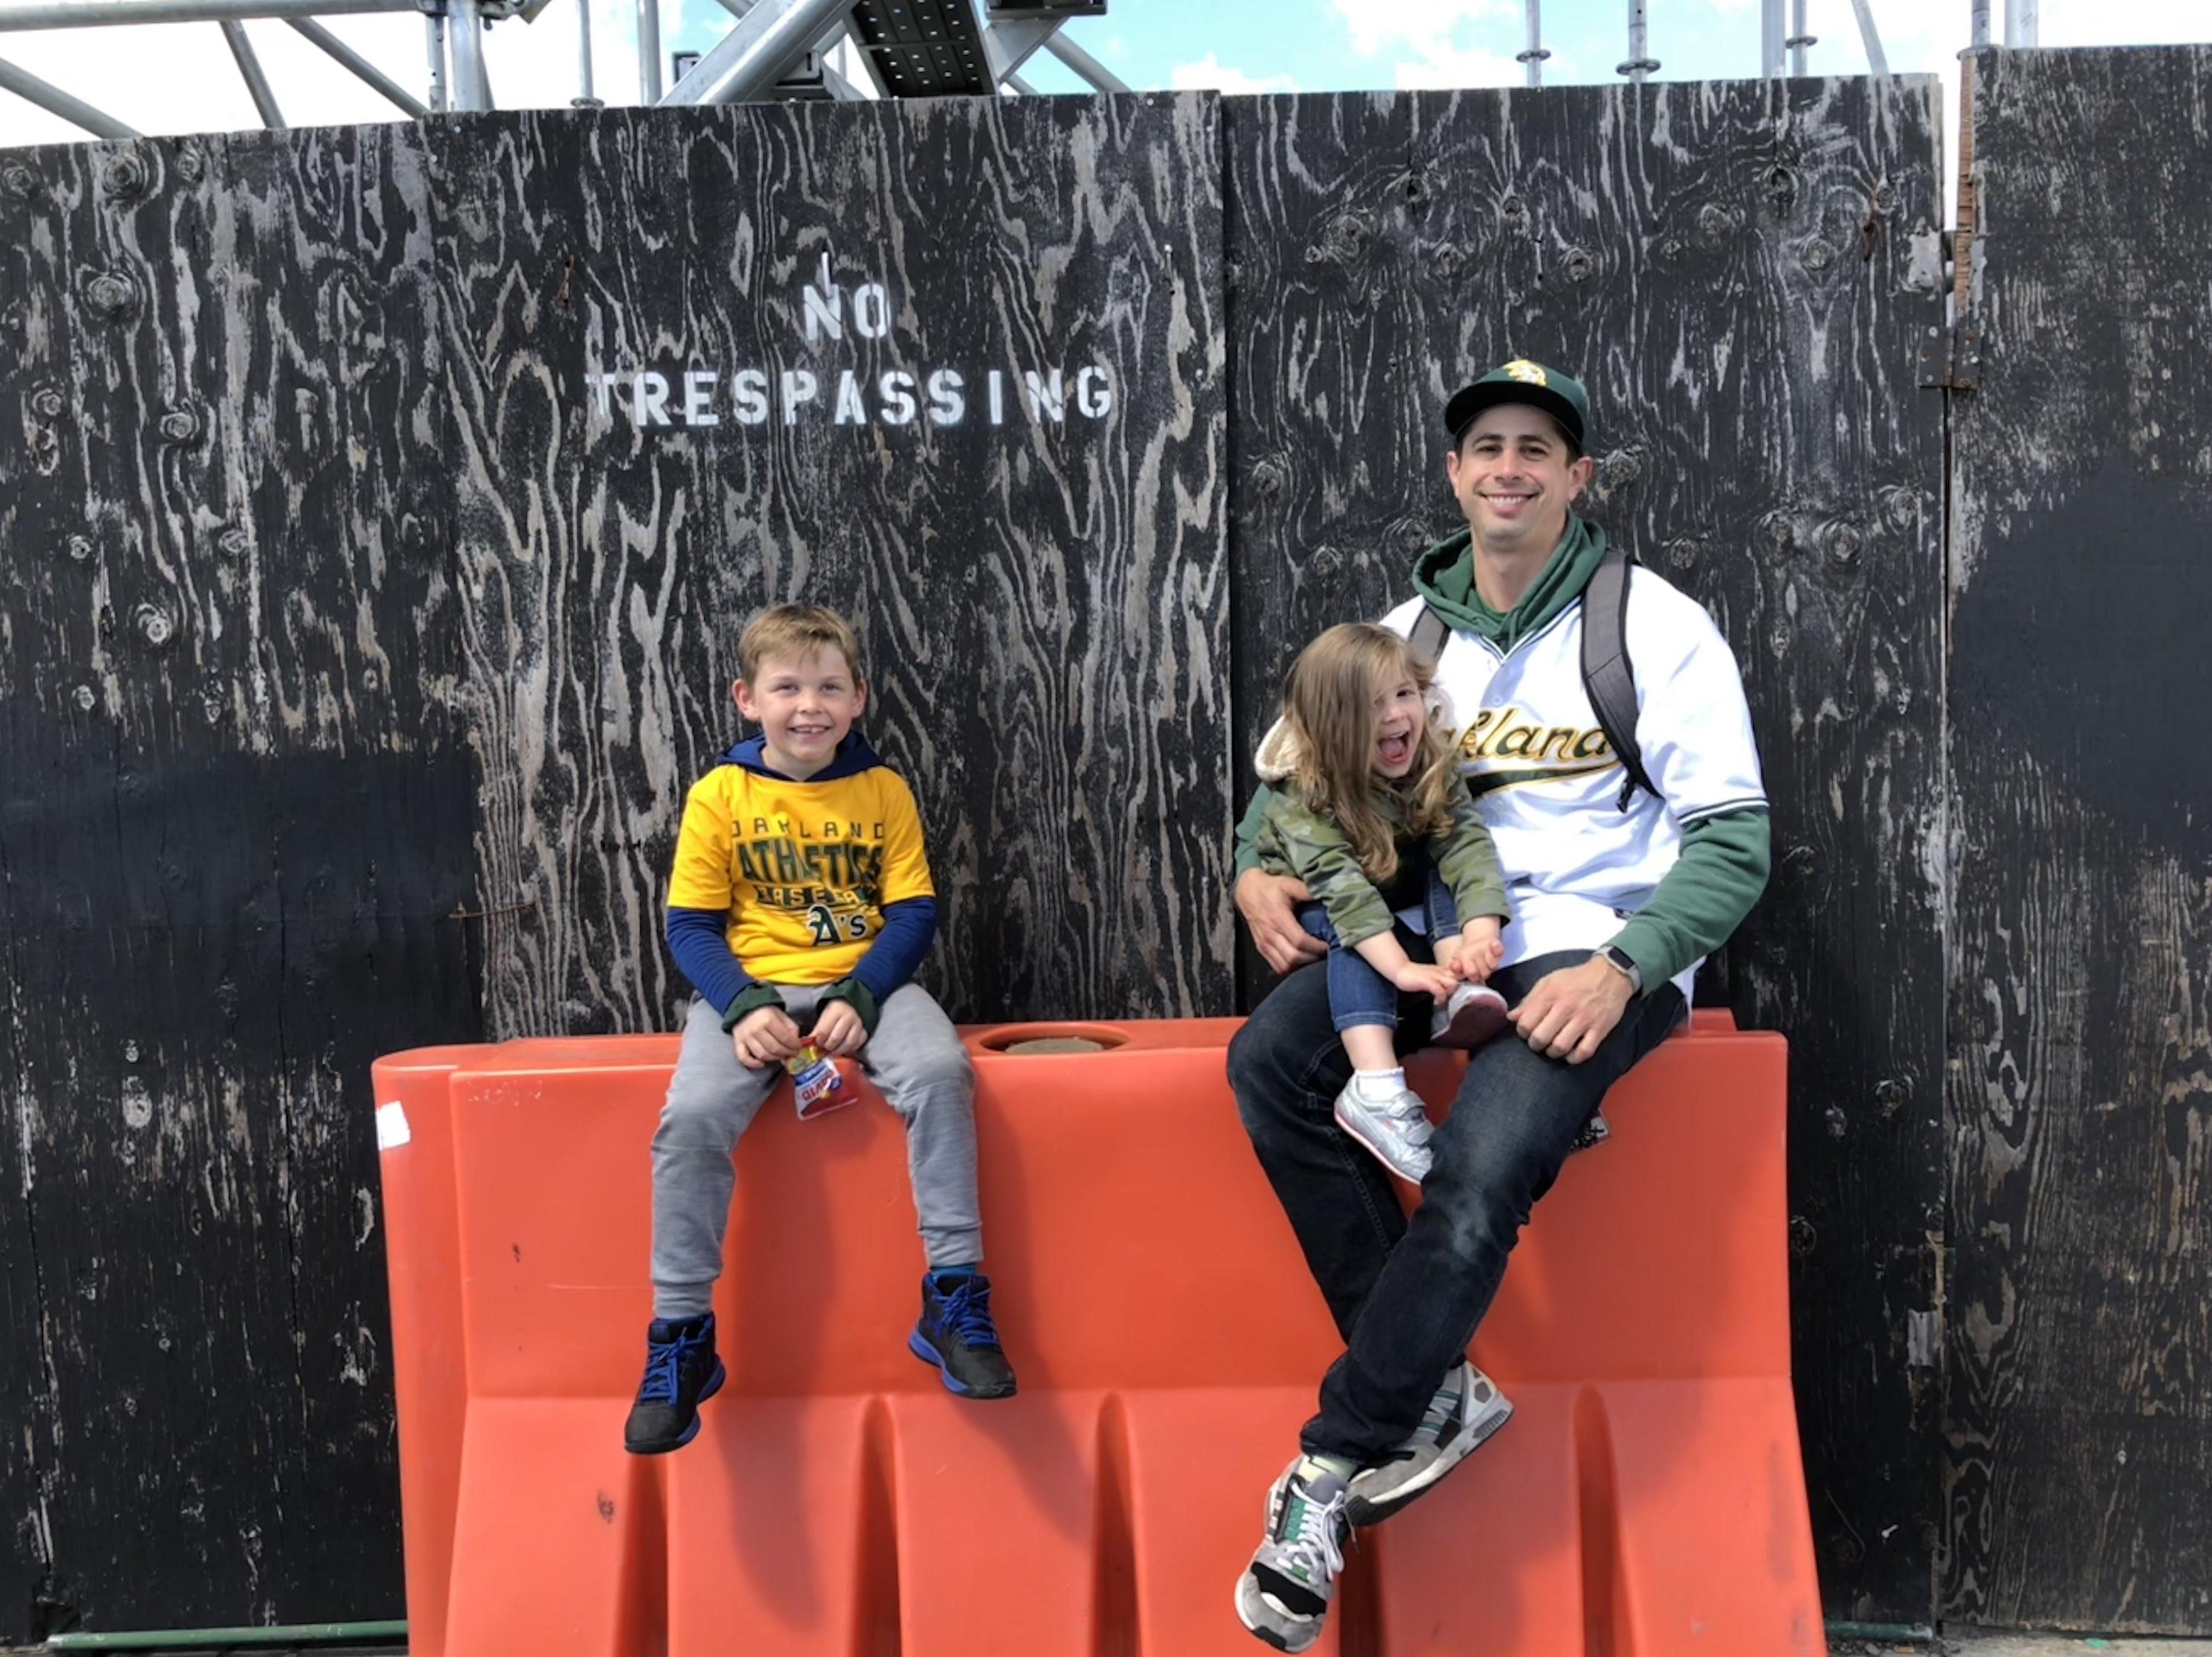 Eli and kids